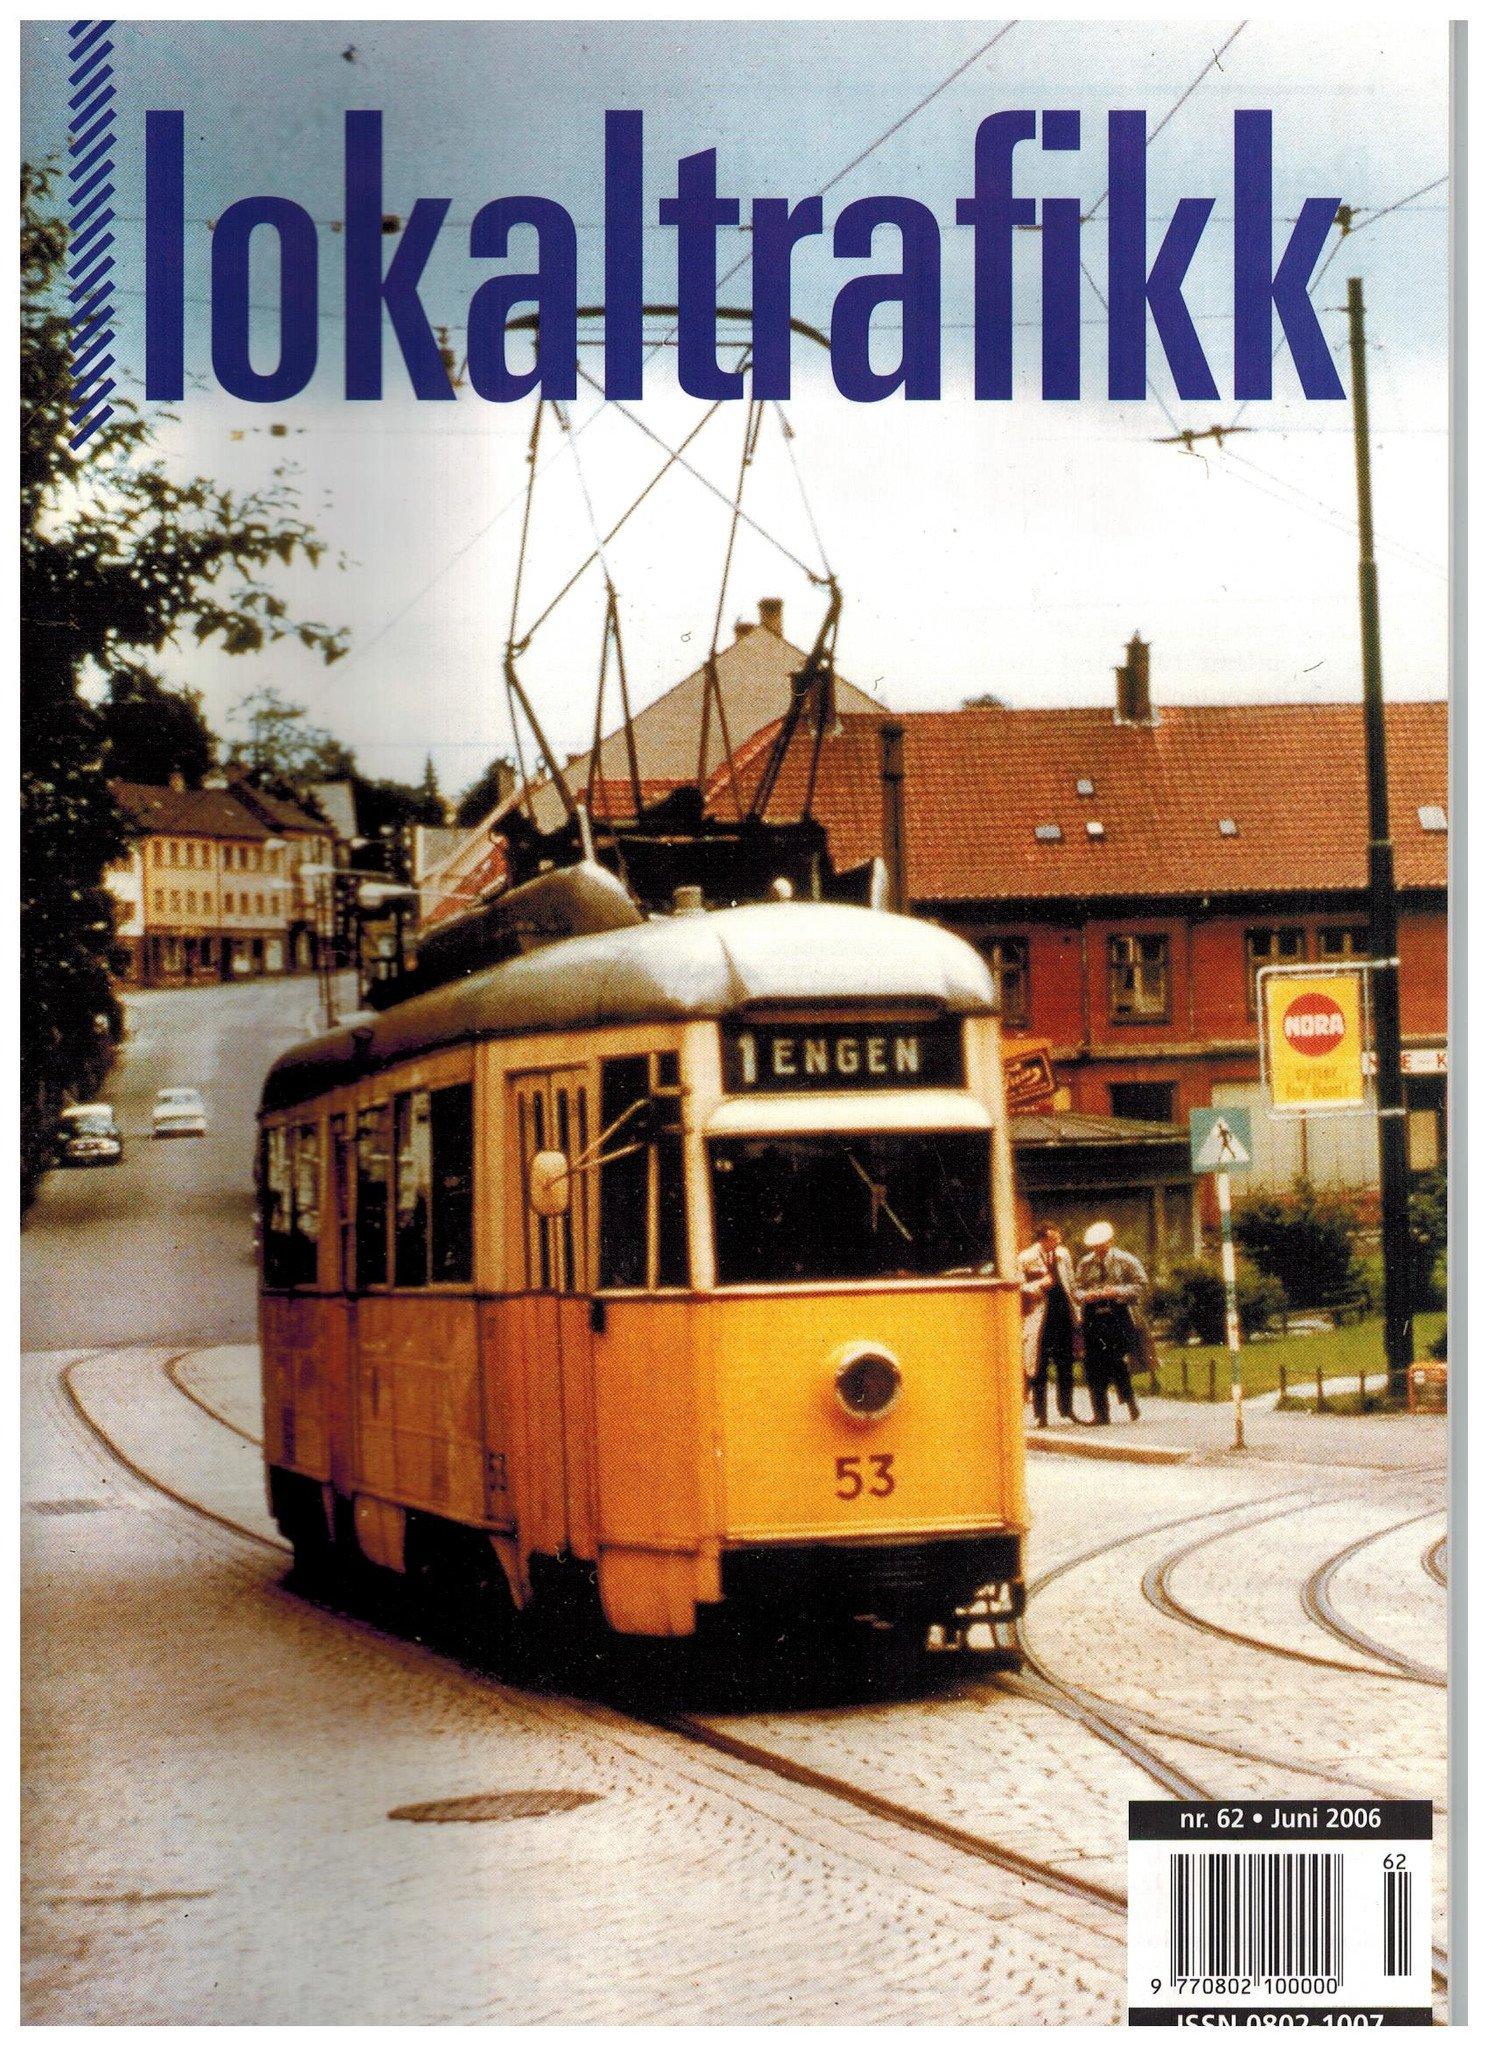 Lokaltrafikk #062